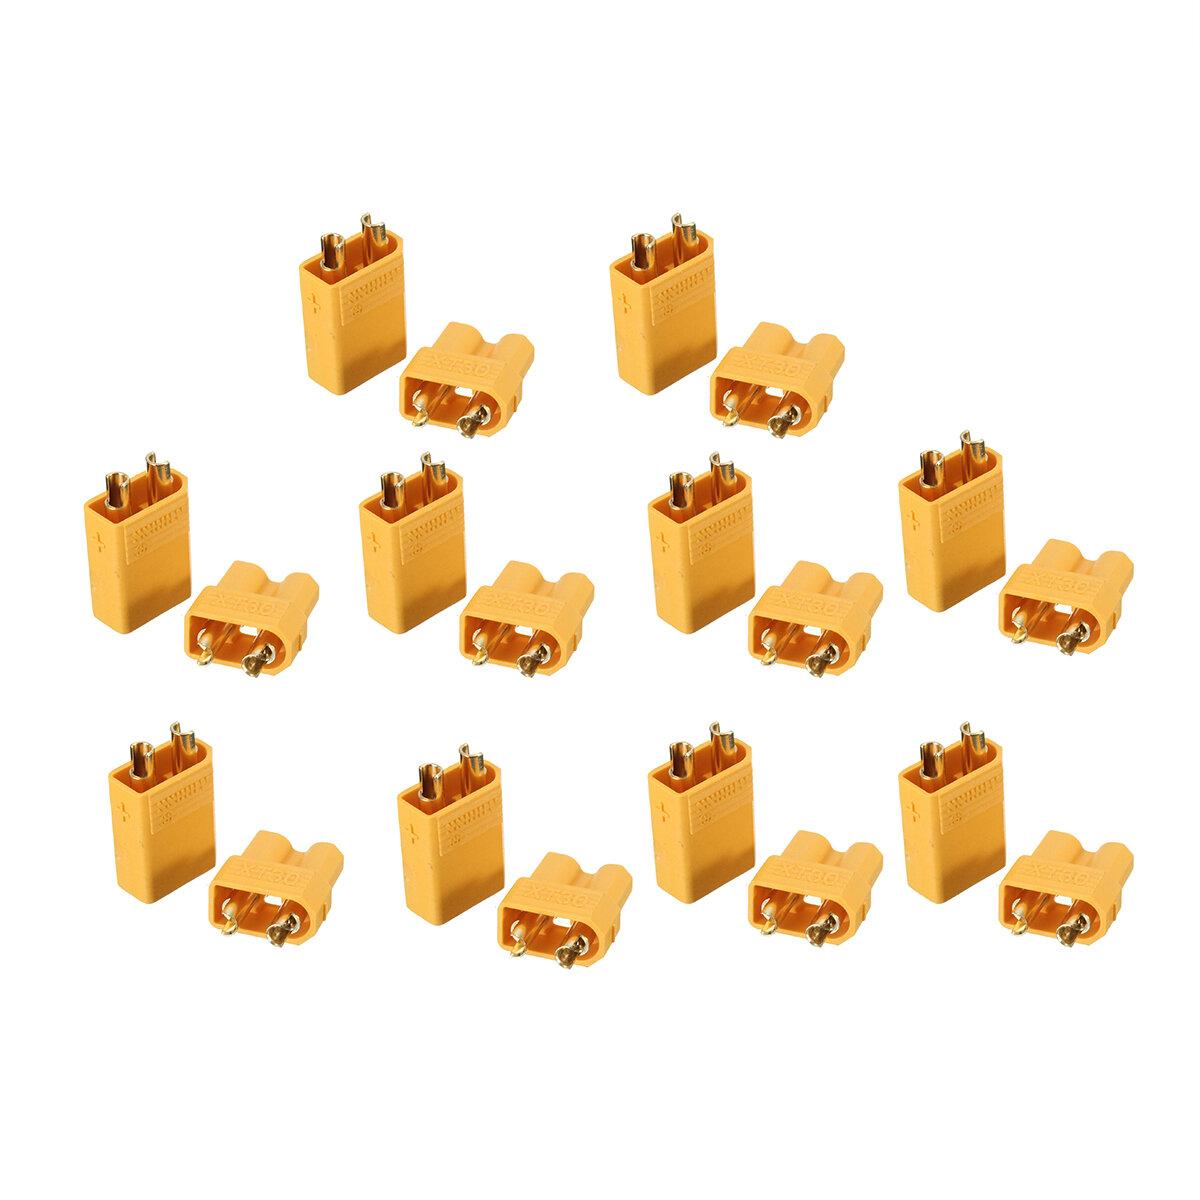 10 coppie XT30 2mm Golden Maschio Femmina Interfaccia spina Connettore